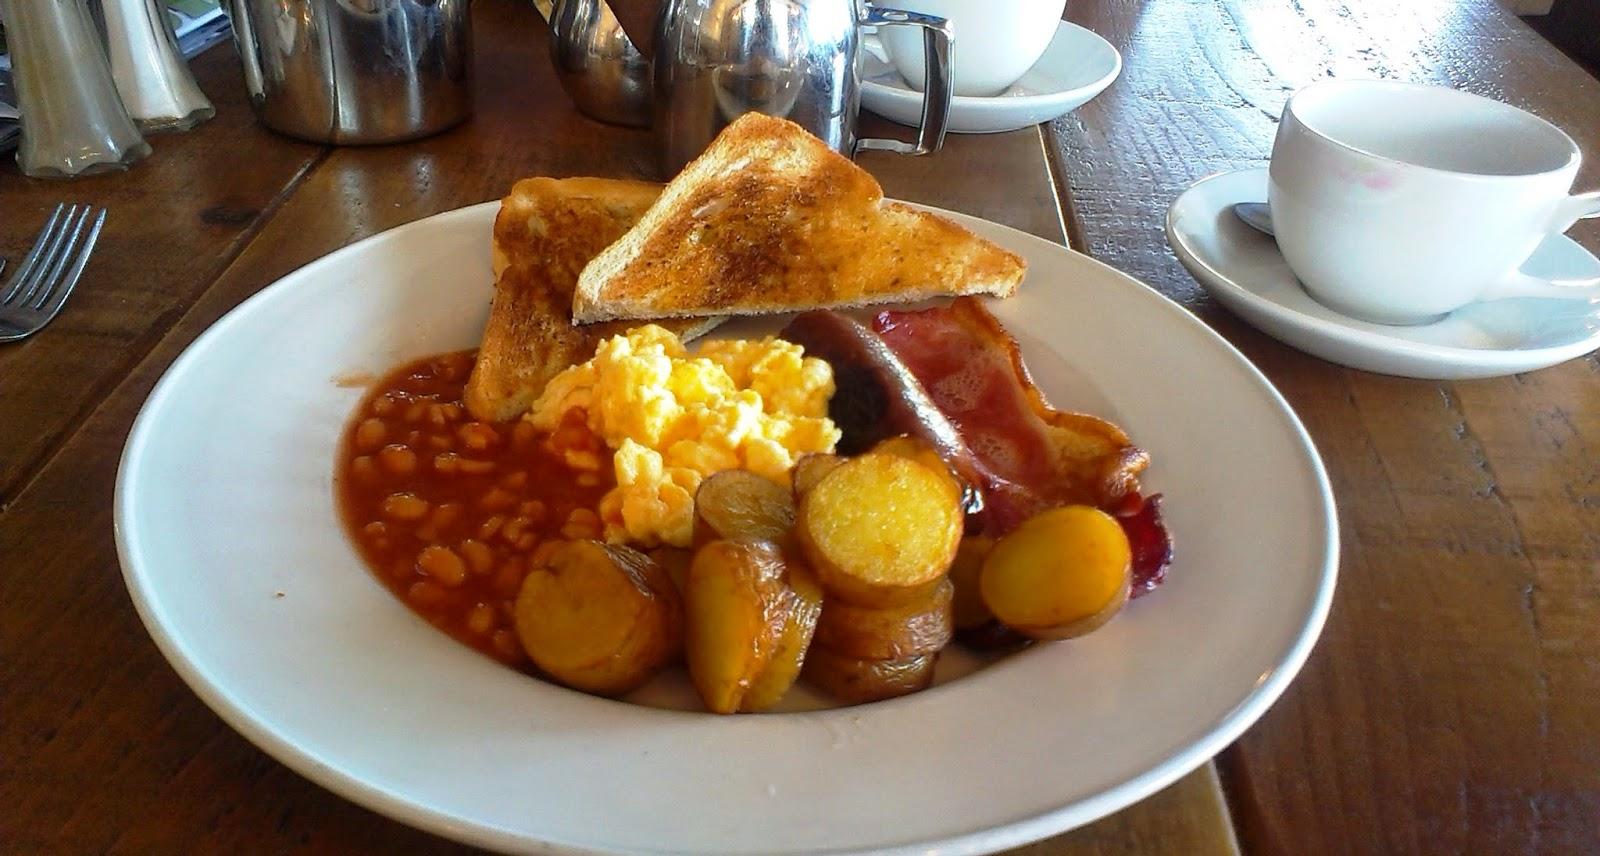 Breakfast at Farrington's Farm Shop